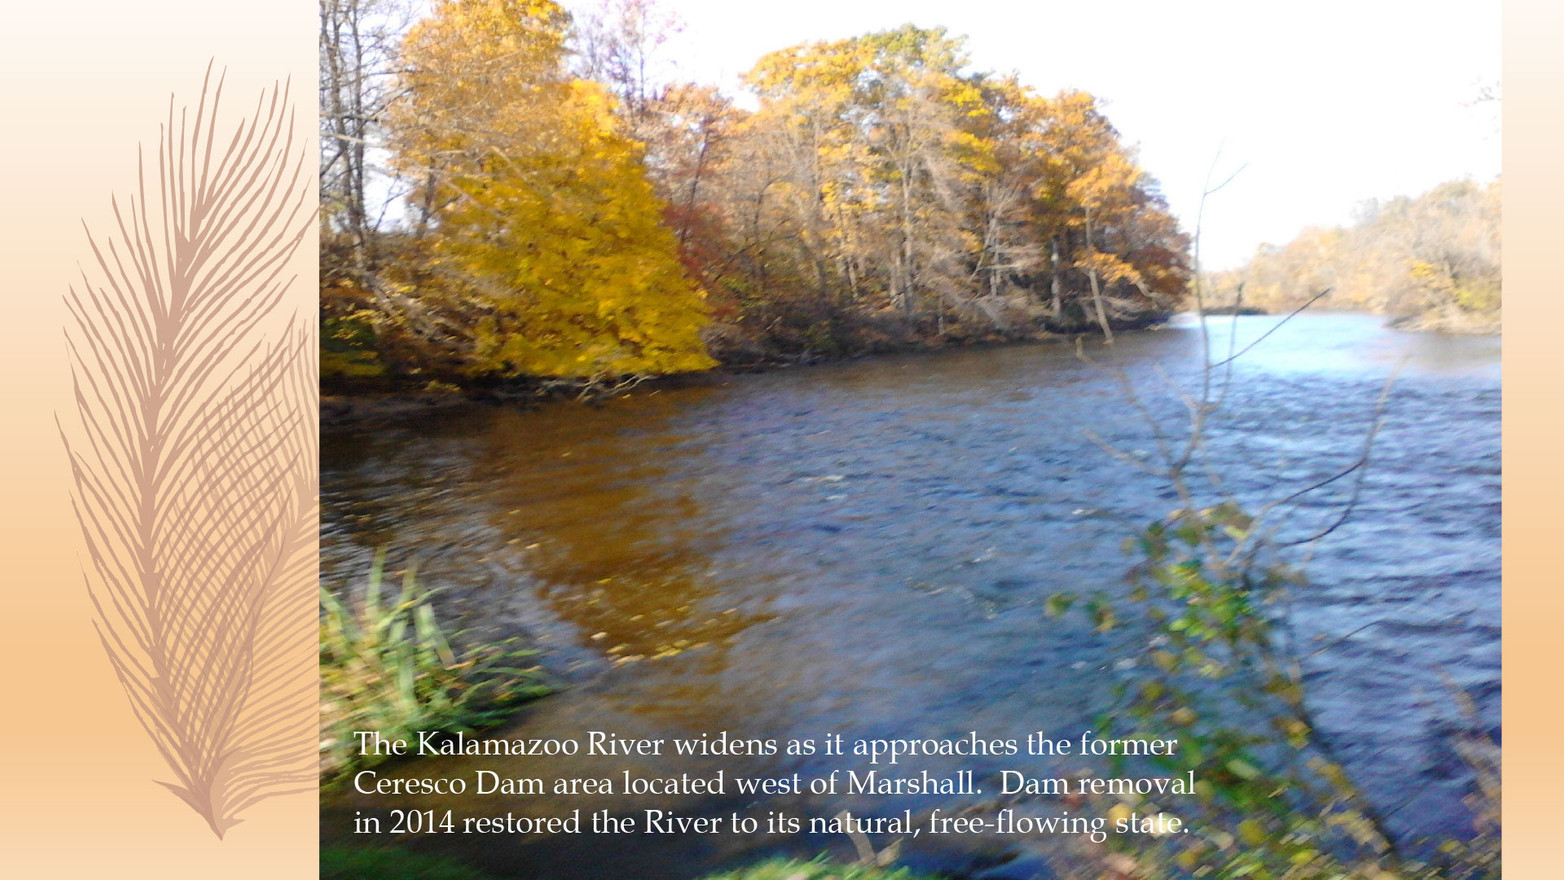 Along-the-Banks-of-the-Kalamazoo-River-7